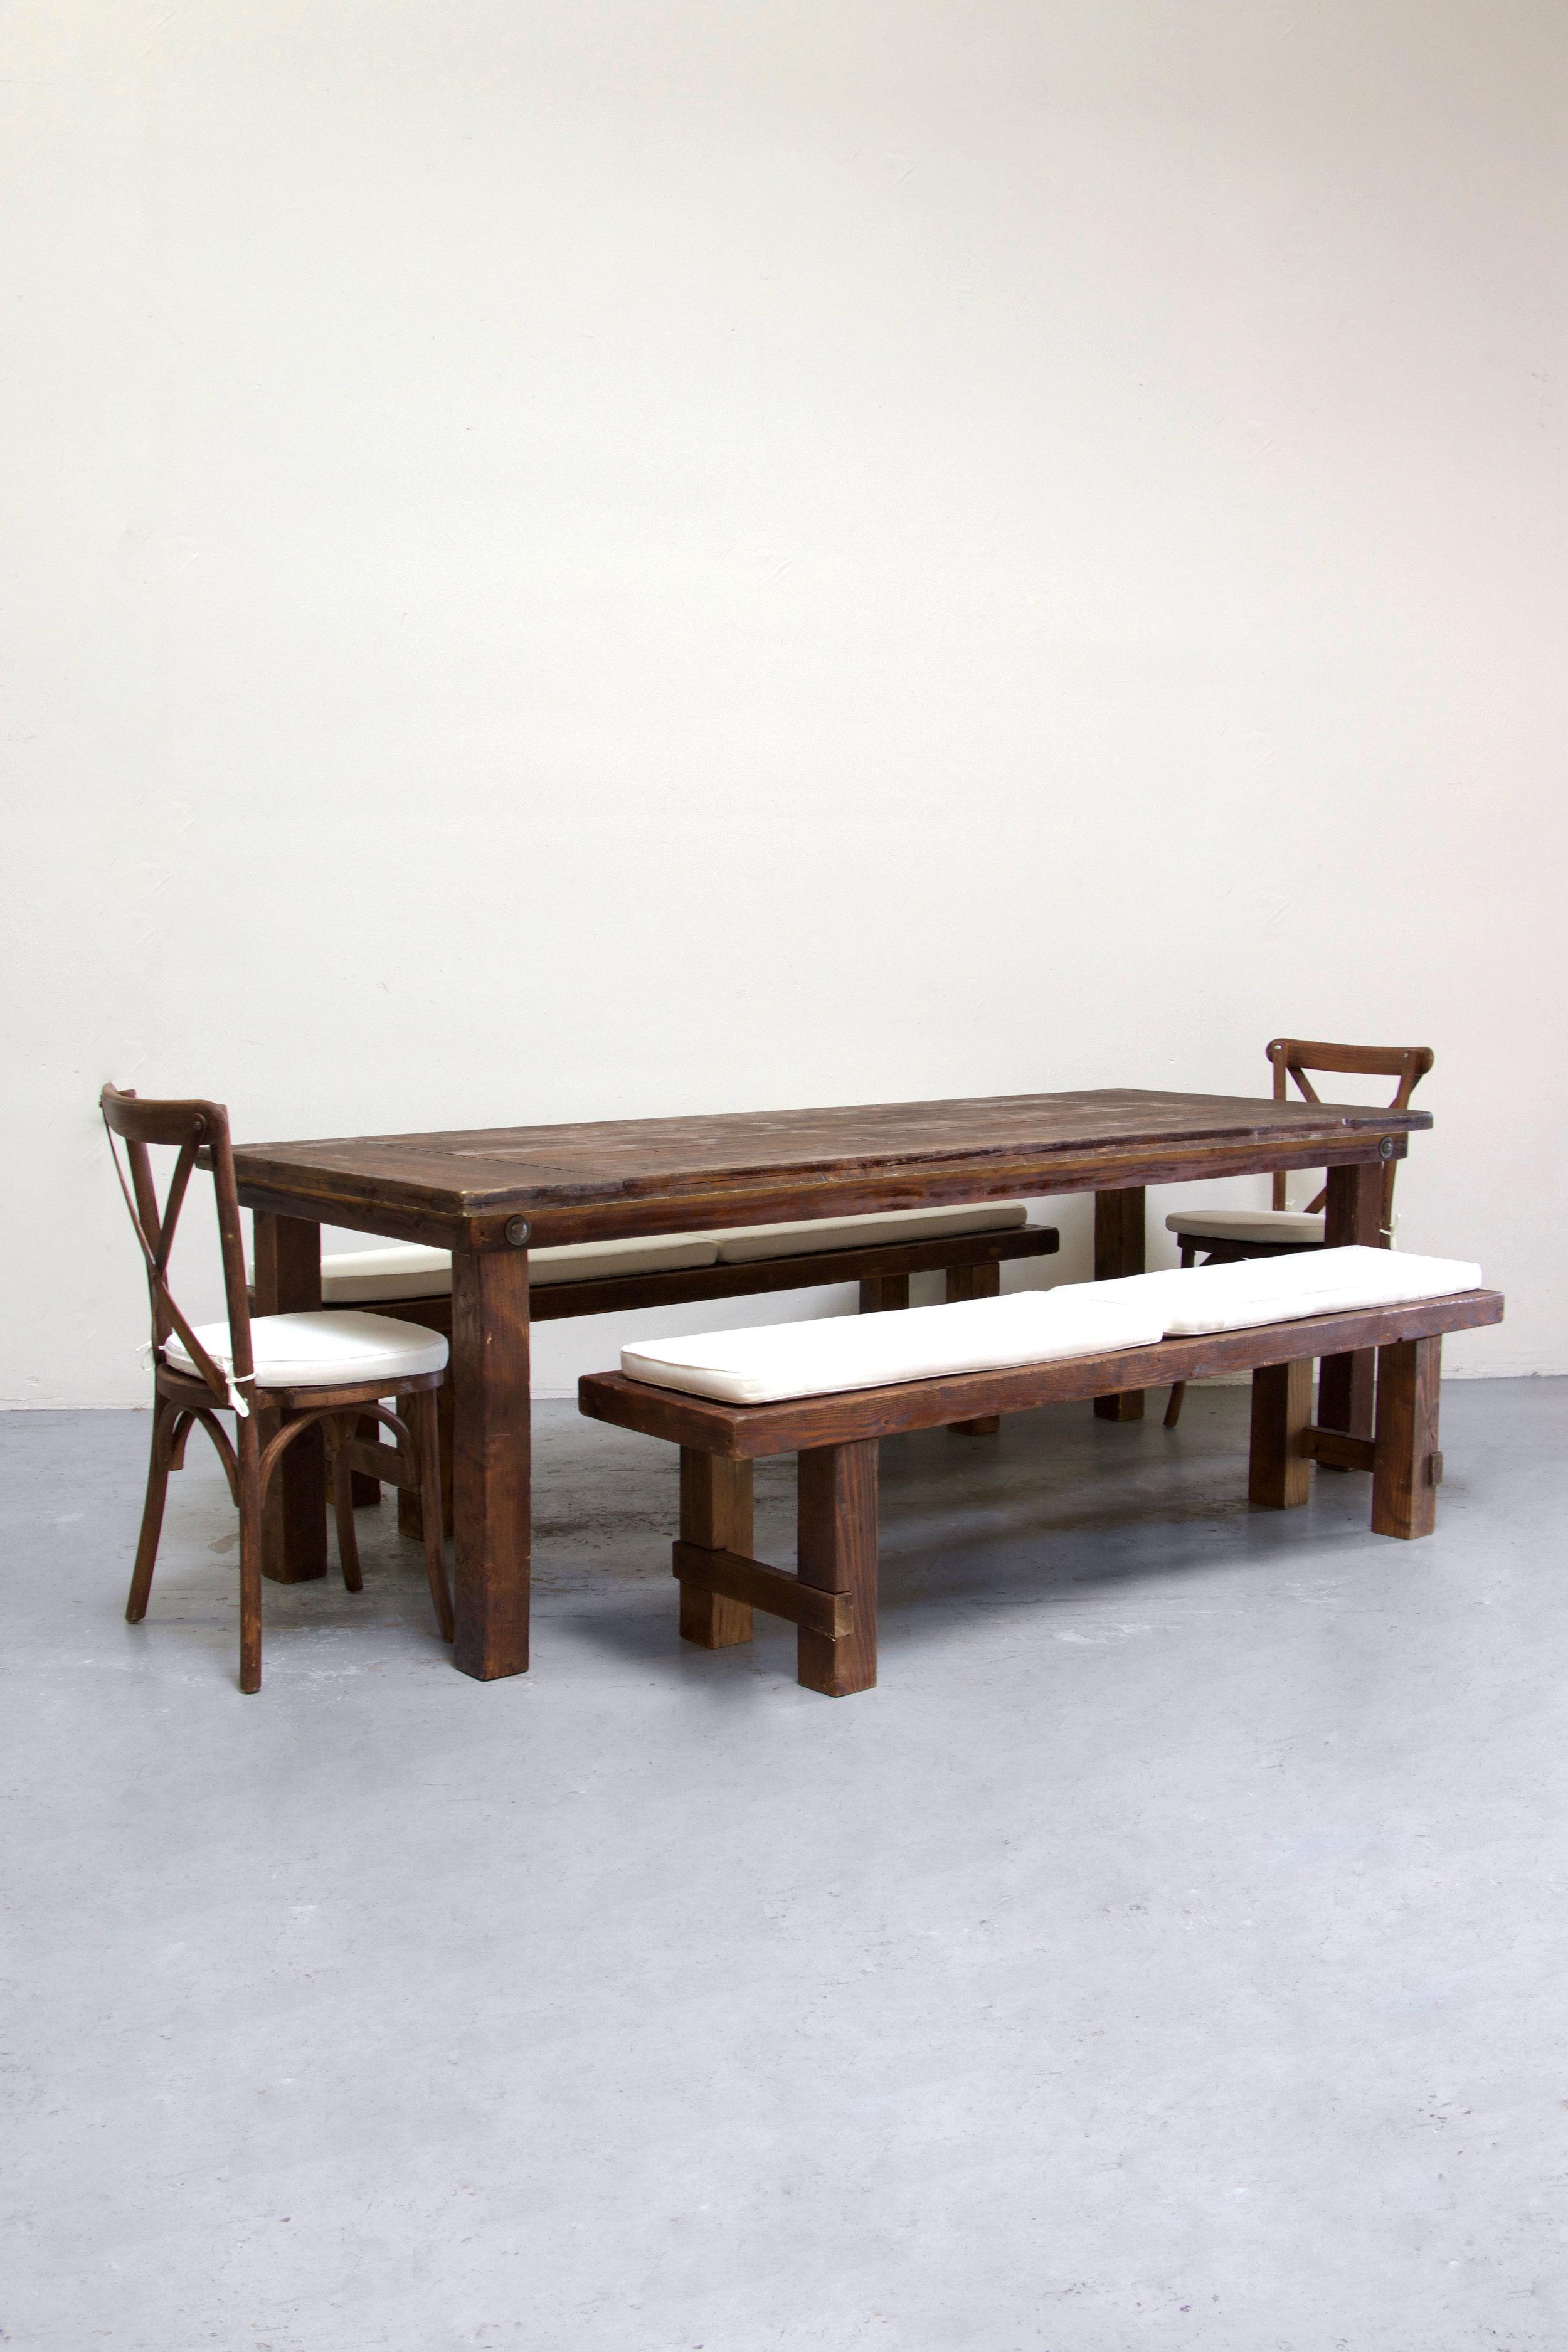 $160 1 Mahogany Farm Table w/ 2 Long Benches & 2 Cross-Back Chairs